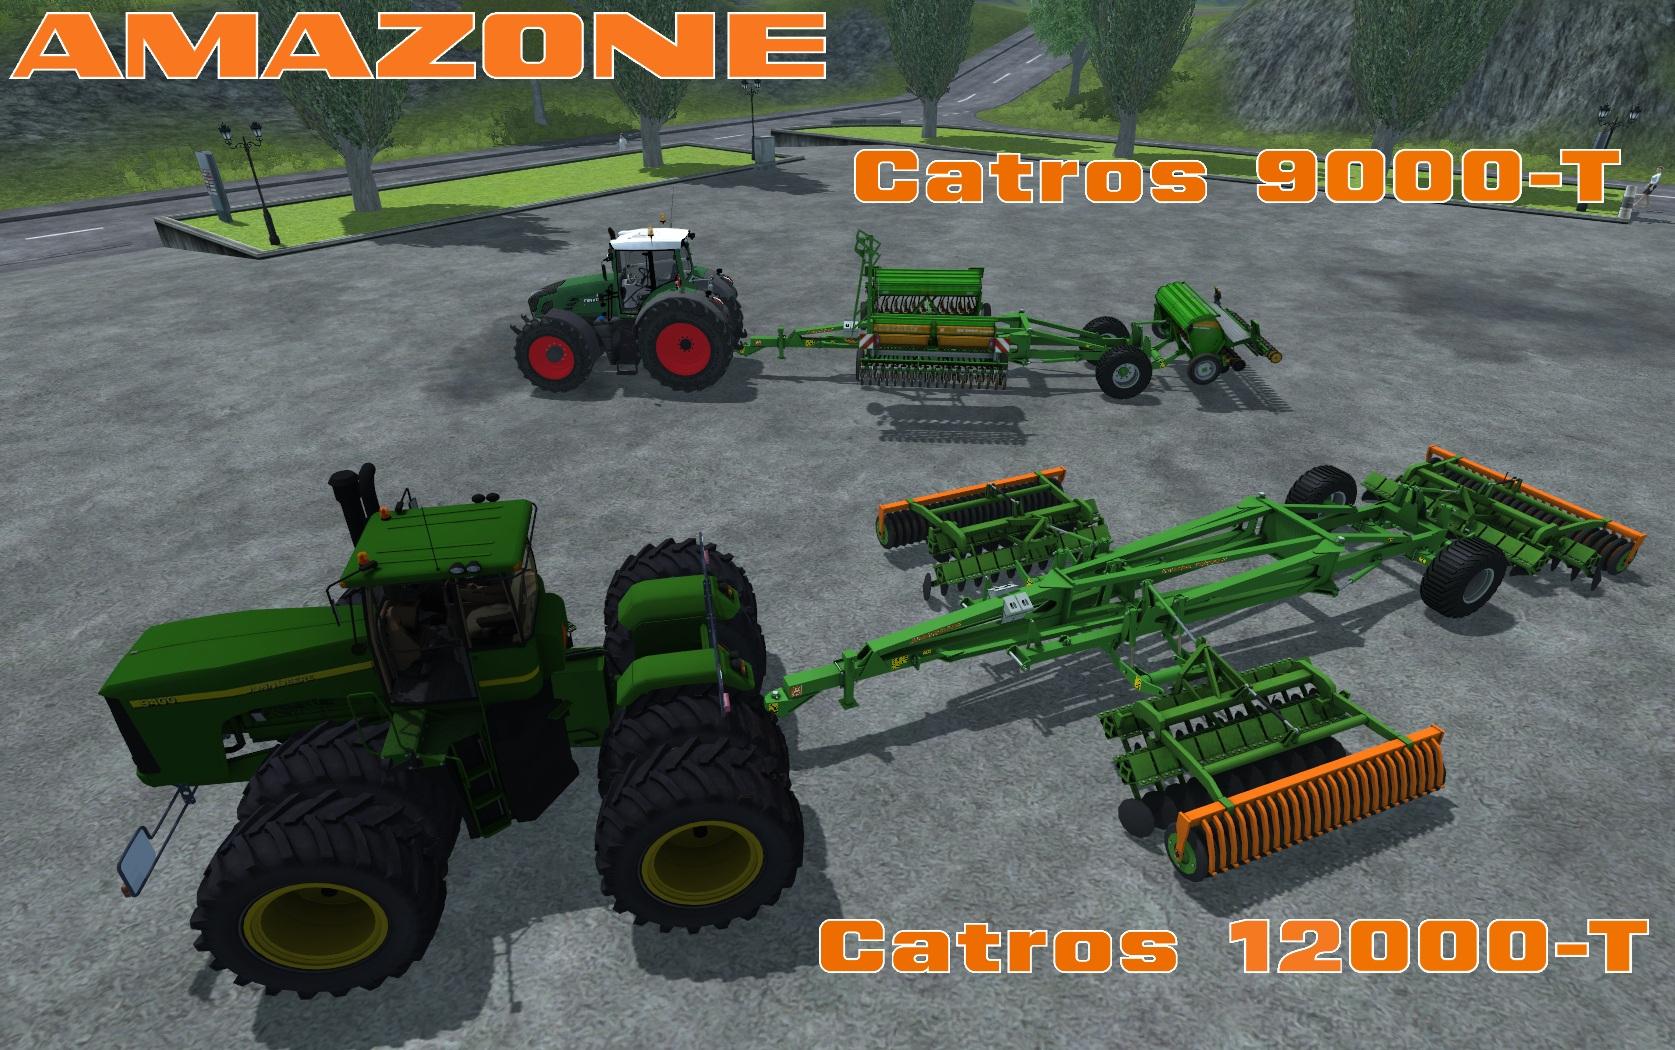 [T.E.P.] Amazone Catros 9000-T y 12000-T Fsscreen_2013_04_17_2w3l5z